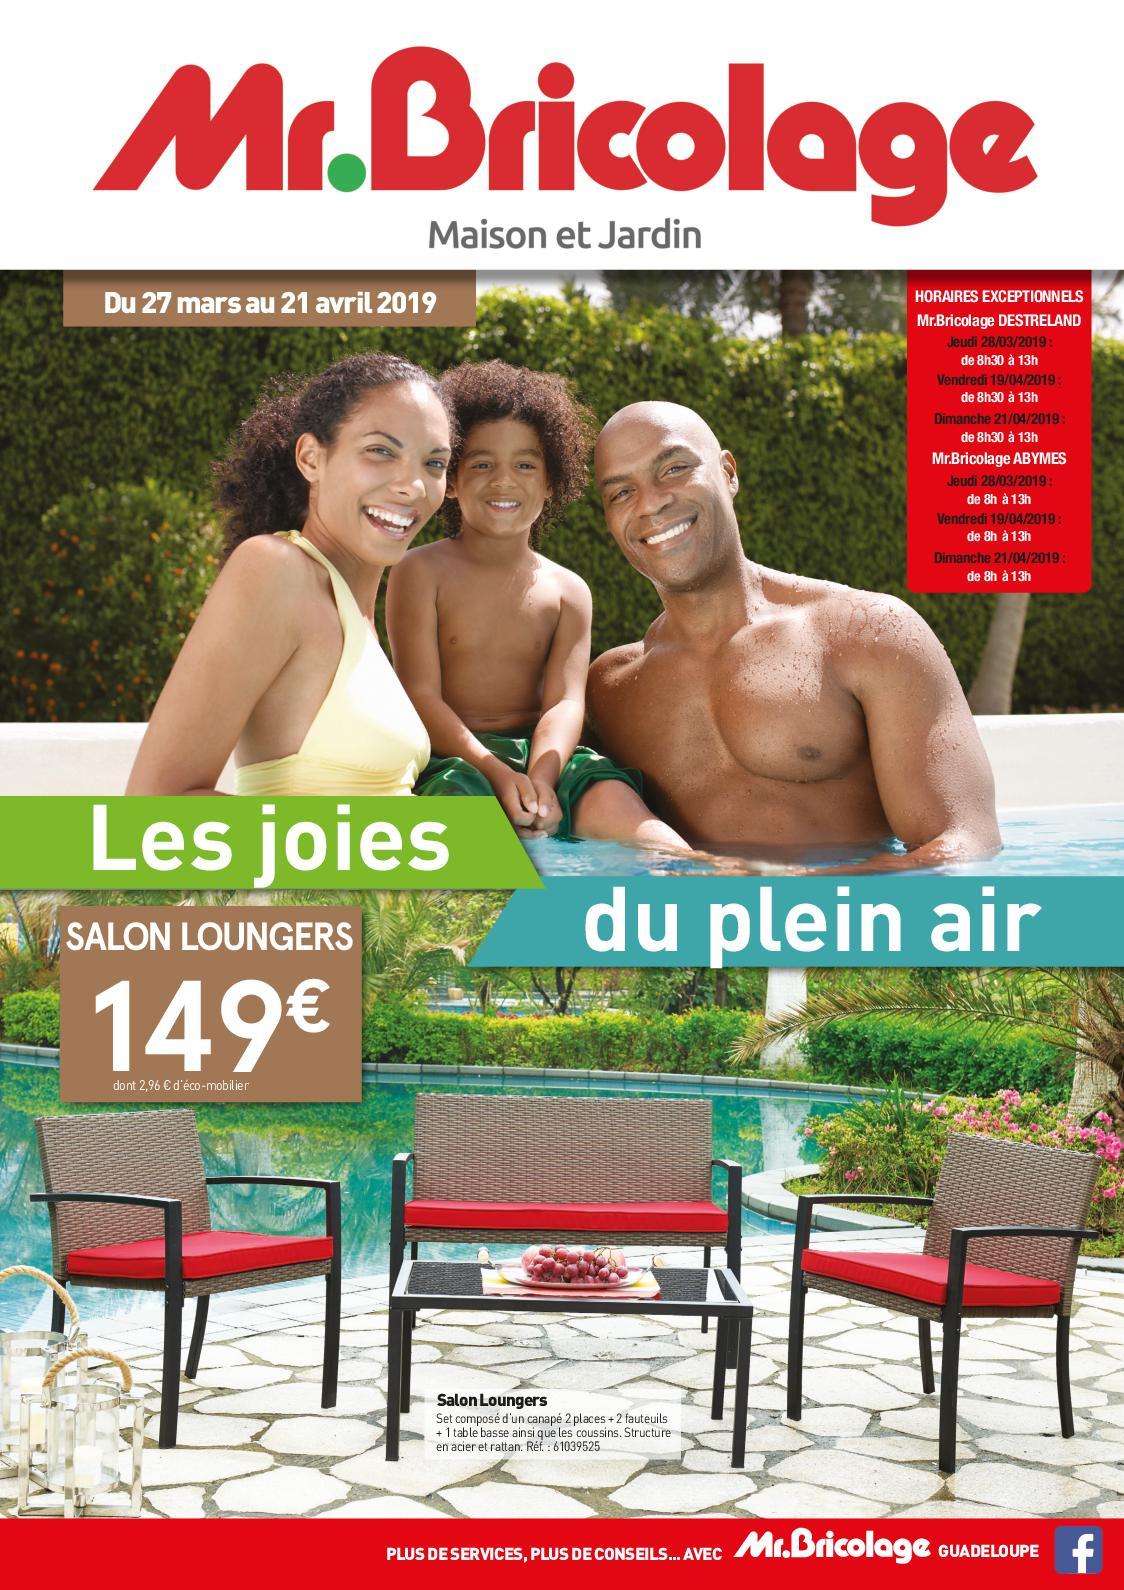 Calaméo - Mr Bricolage Guadeloupe - Catalogue Plein Air 2019 concernant Mr Bricolage Piscine